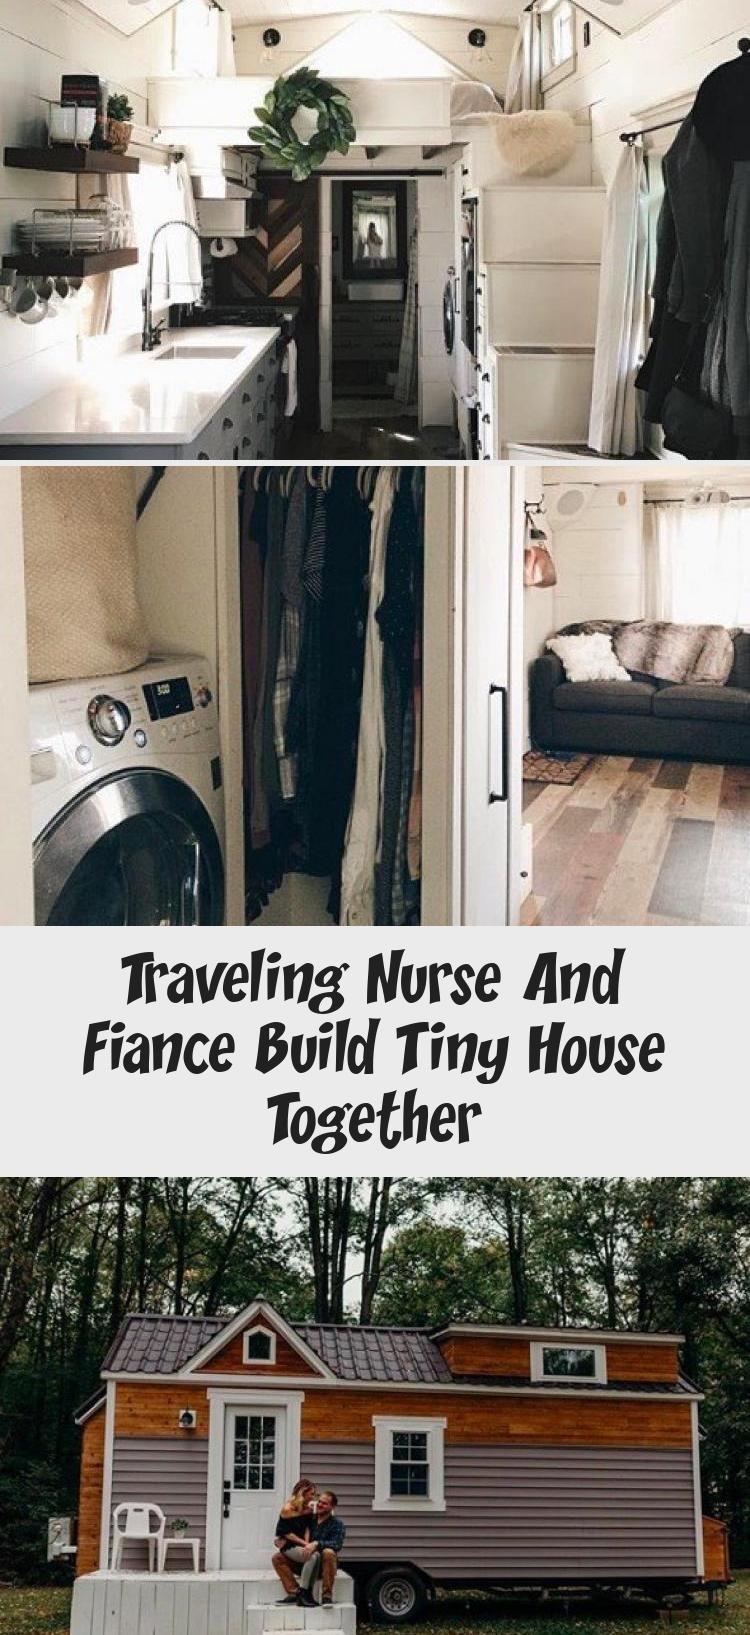 Traveling Nurse and Fiance Build Tiny House Together Tiny House Movement // Tiny...,  #Build #diyhomebuildingtinyhouses #Fiance #HOUSE #Movement #Nurse #tiny #Traveling